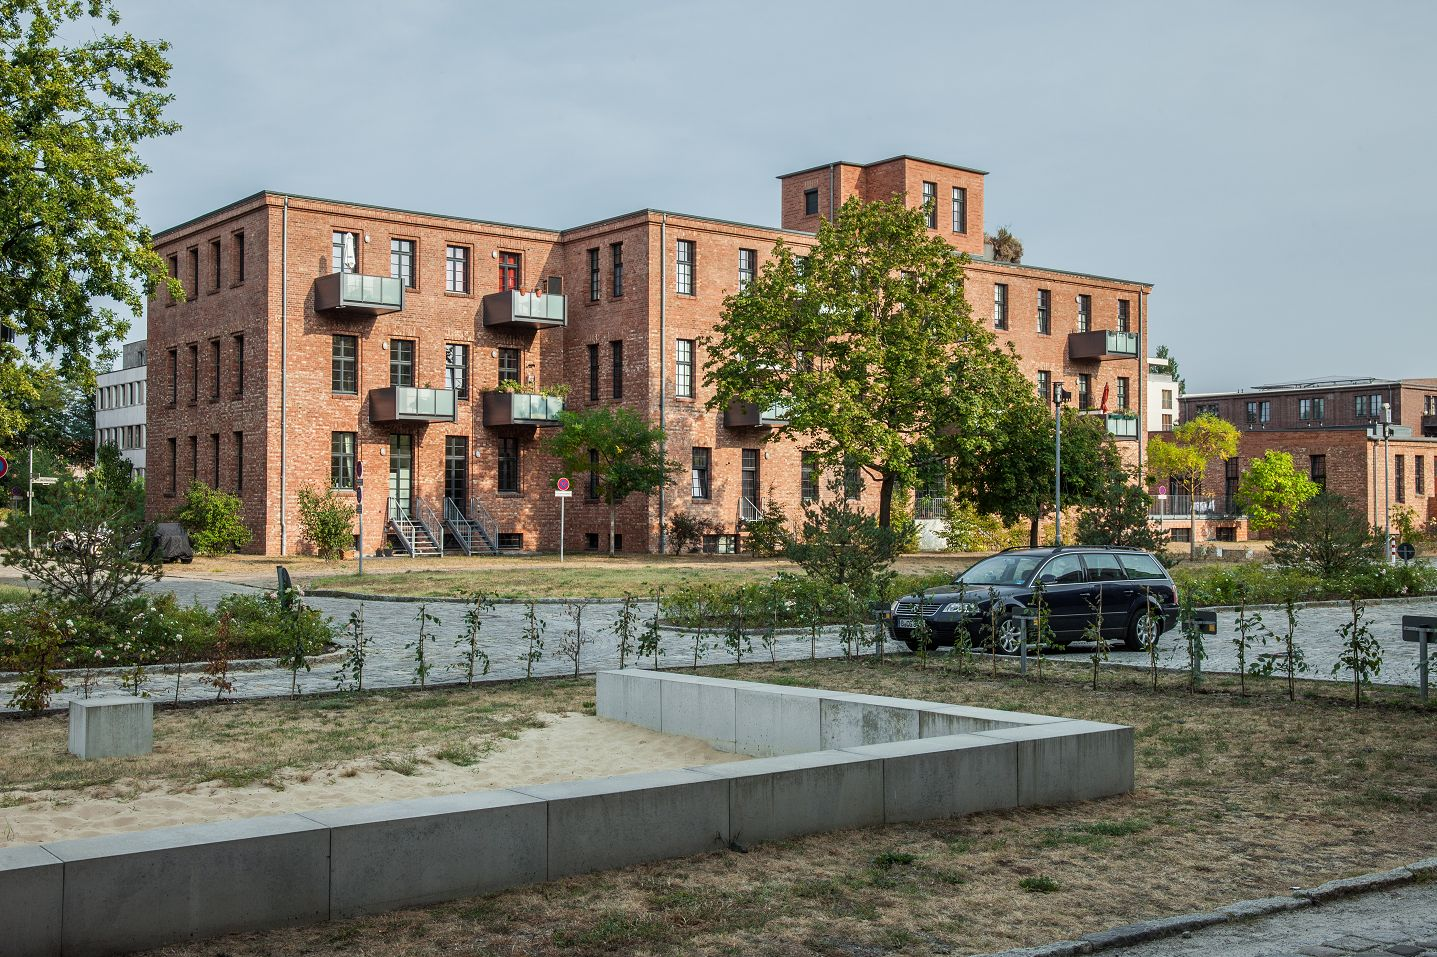 235 Glanzfilmfabrik